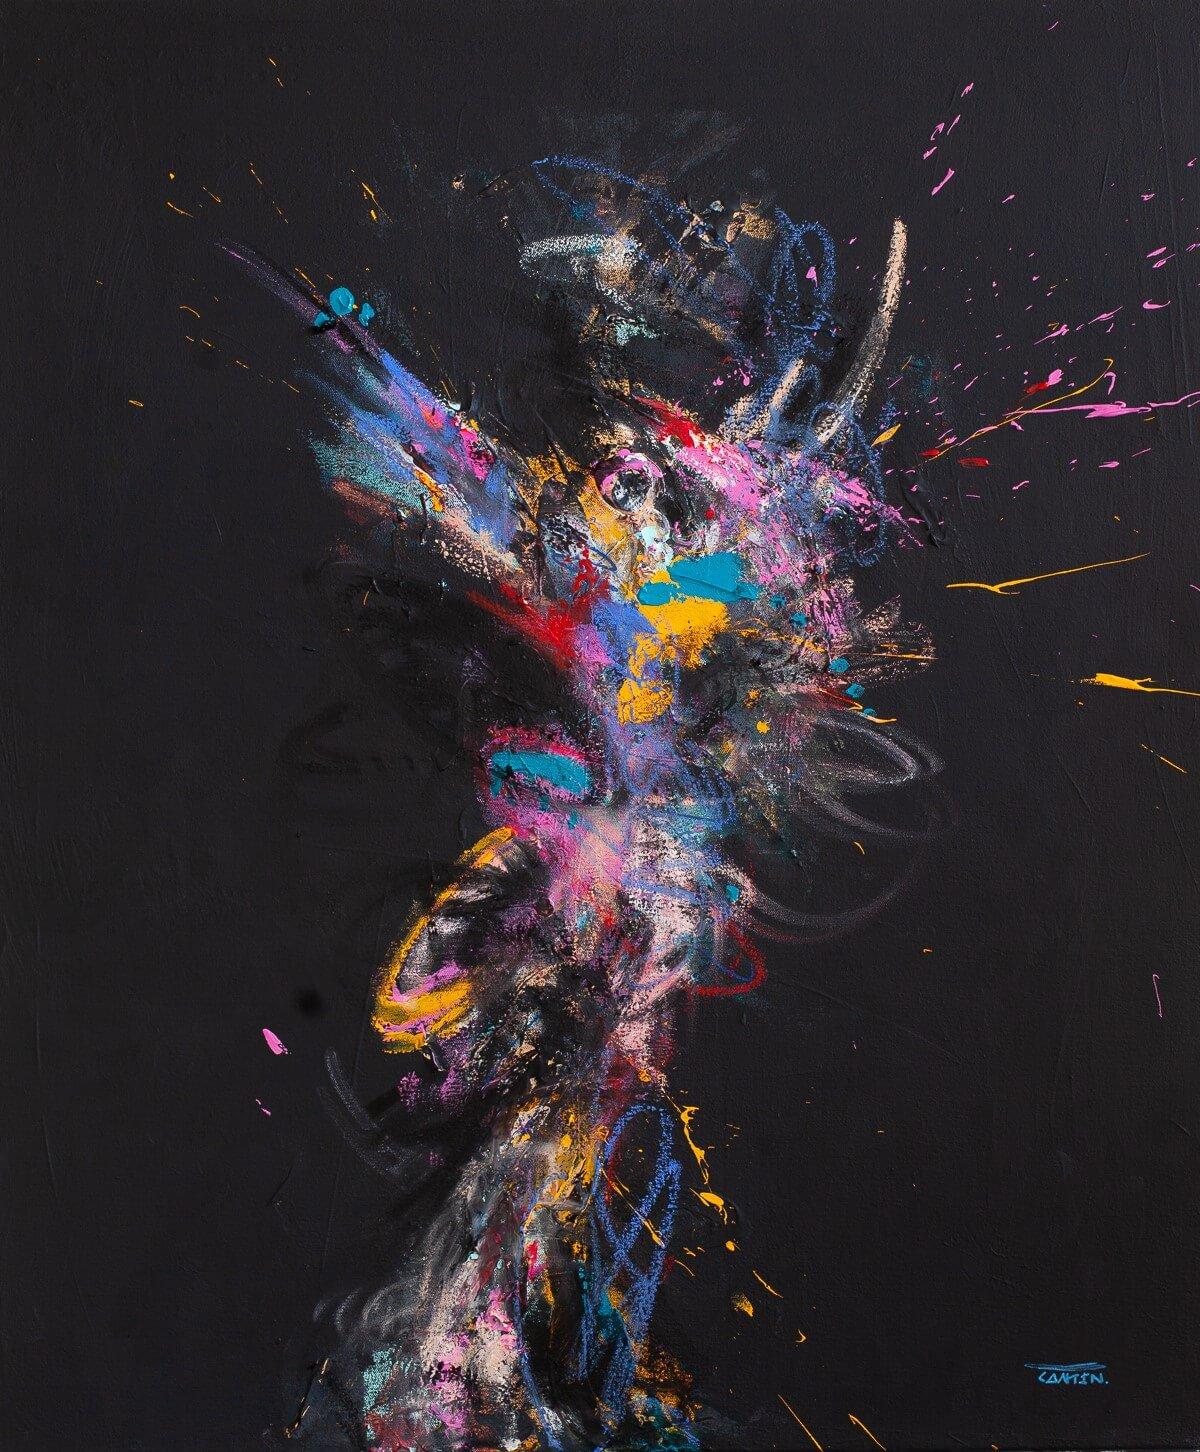 Pat Cantin Artiste Peintre / Péo